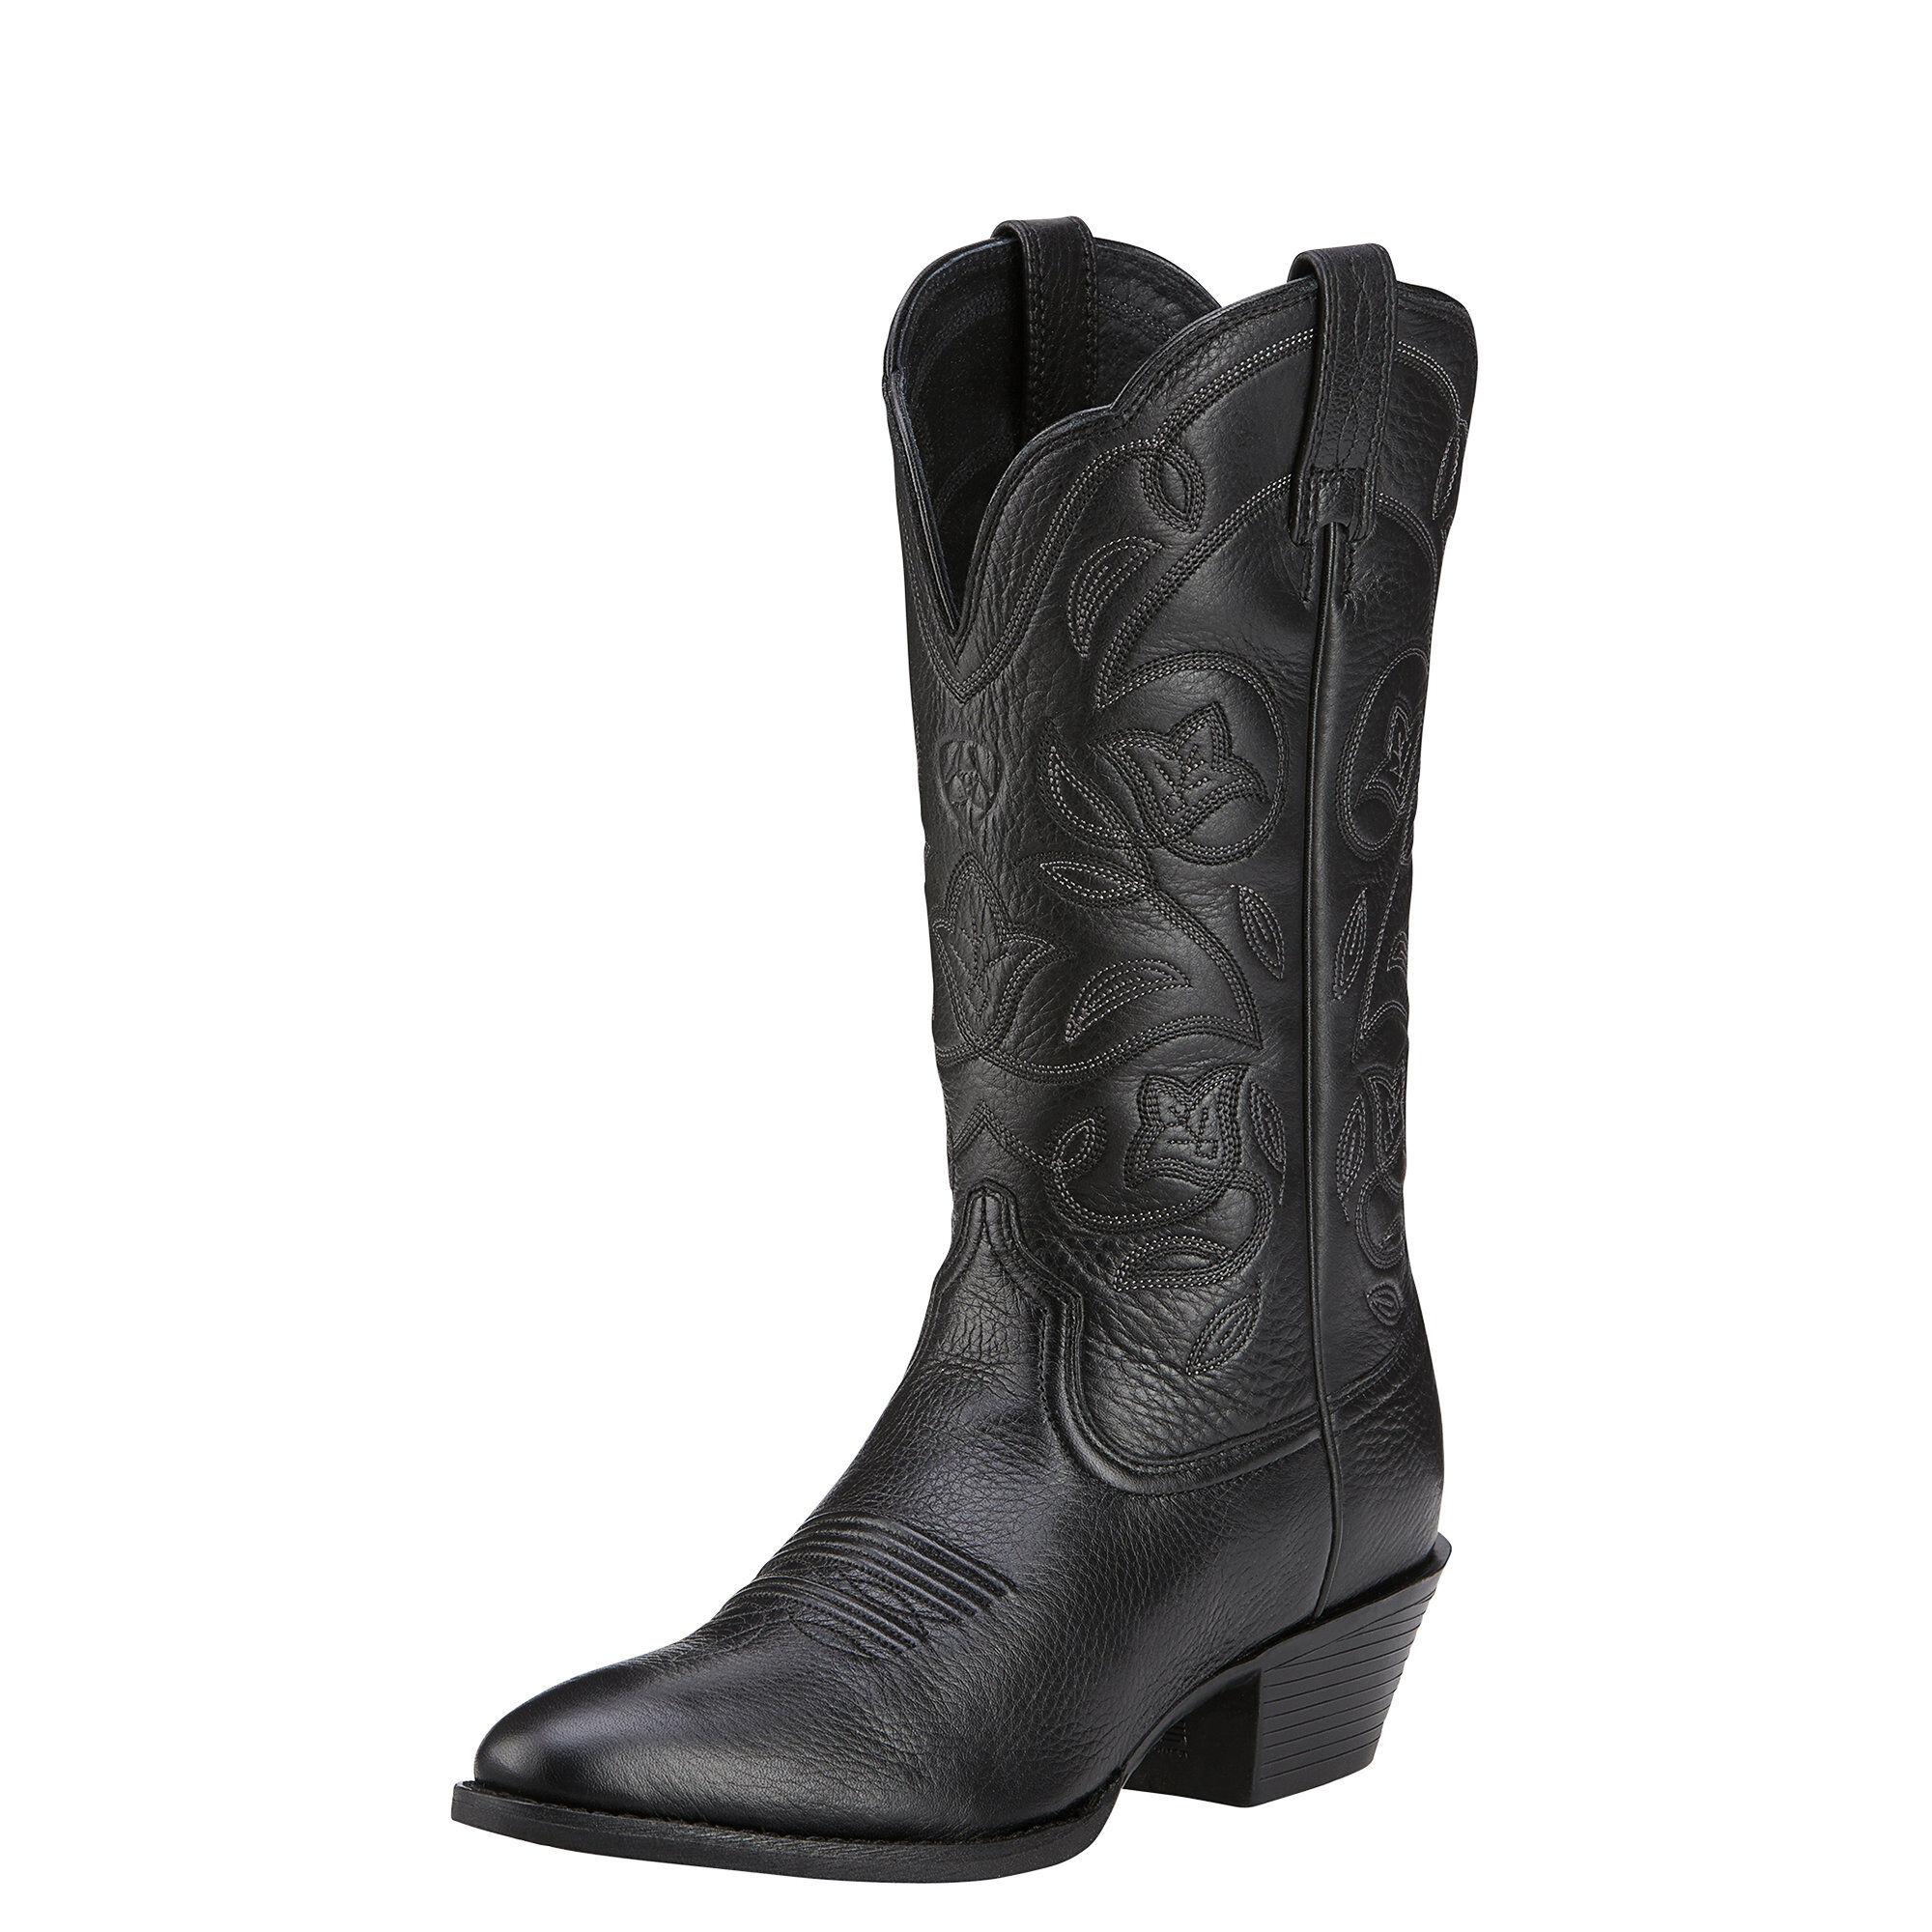 Women's Heritage R Toe Western Boots in Black Deertan by Ariat